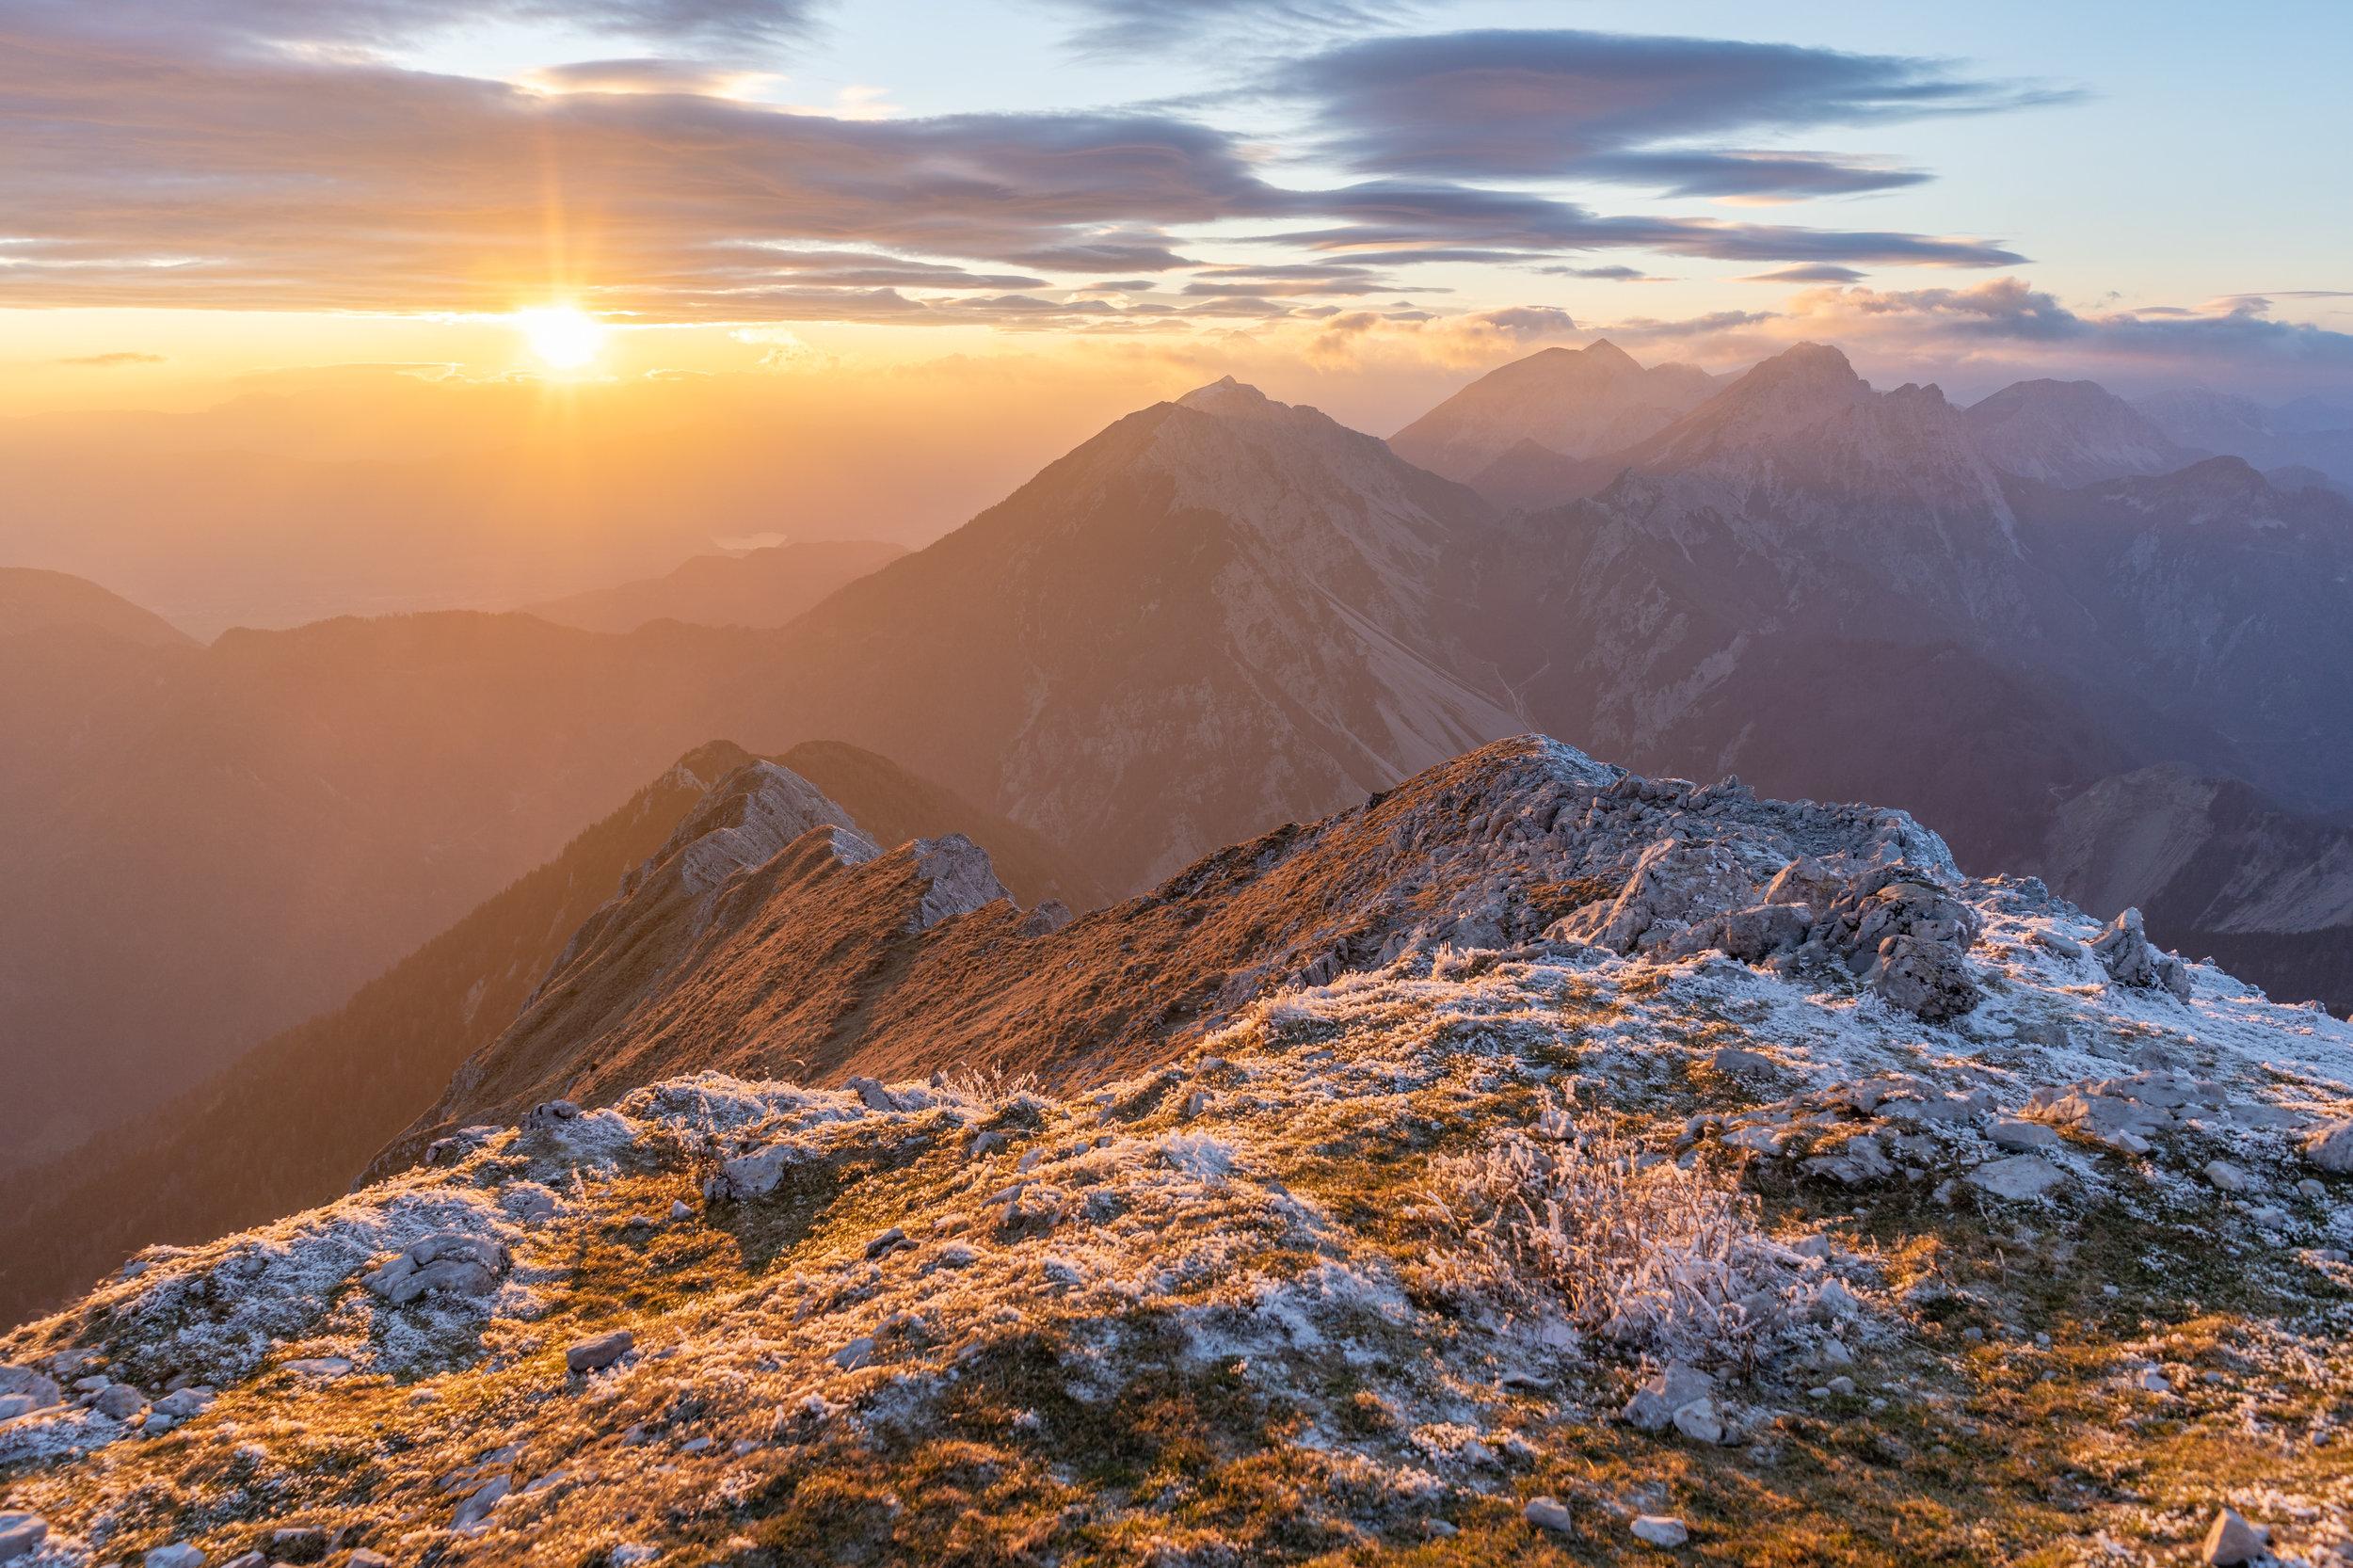 On top of Mt. Veliki vrh (2088 m).